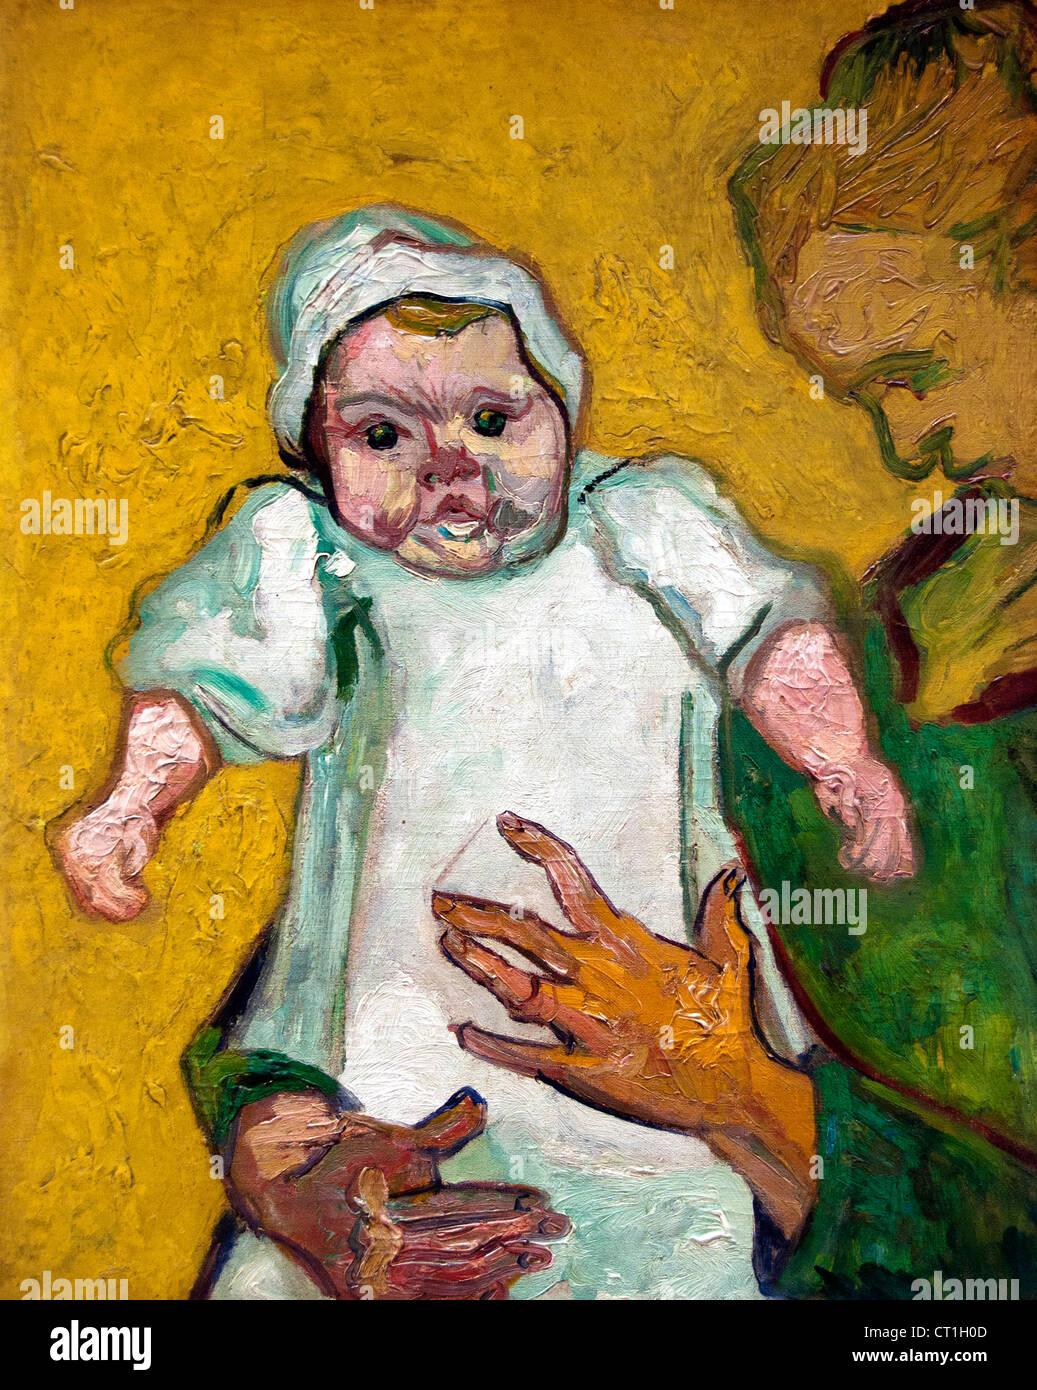 Madame roulin e il suo bambino 1888 vincent van gogh 1853 for Ciao bambini van gogh